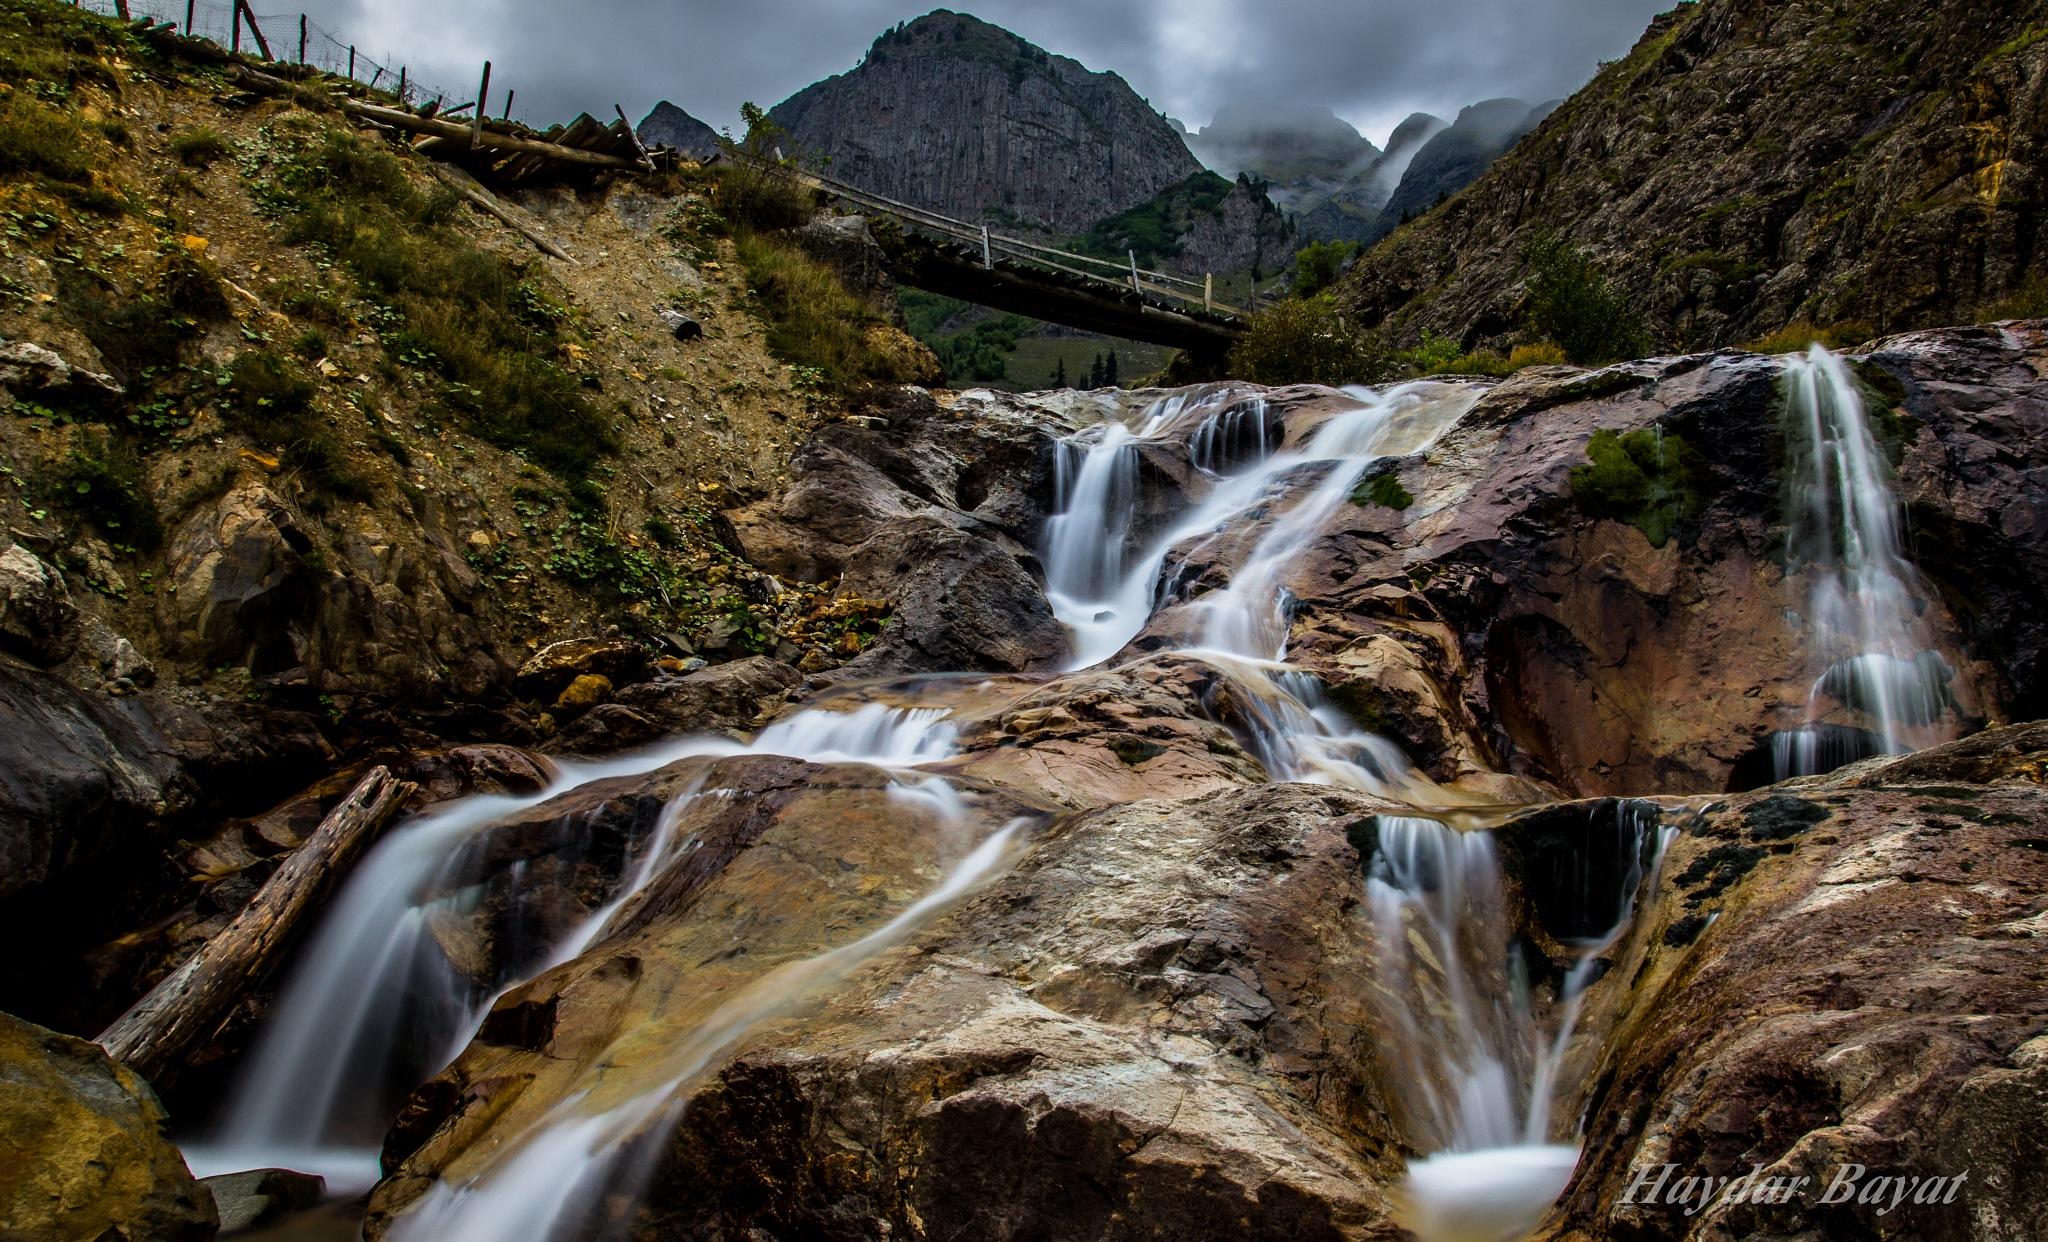 Waterfall by Haydar Bayat